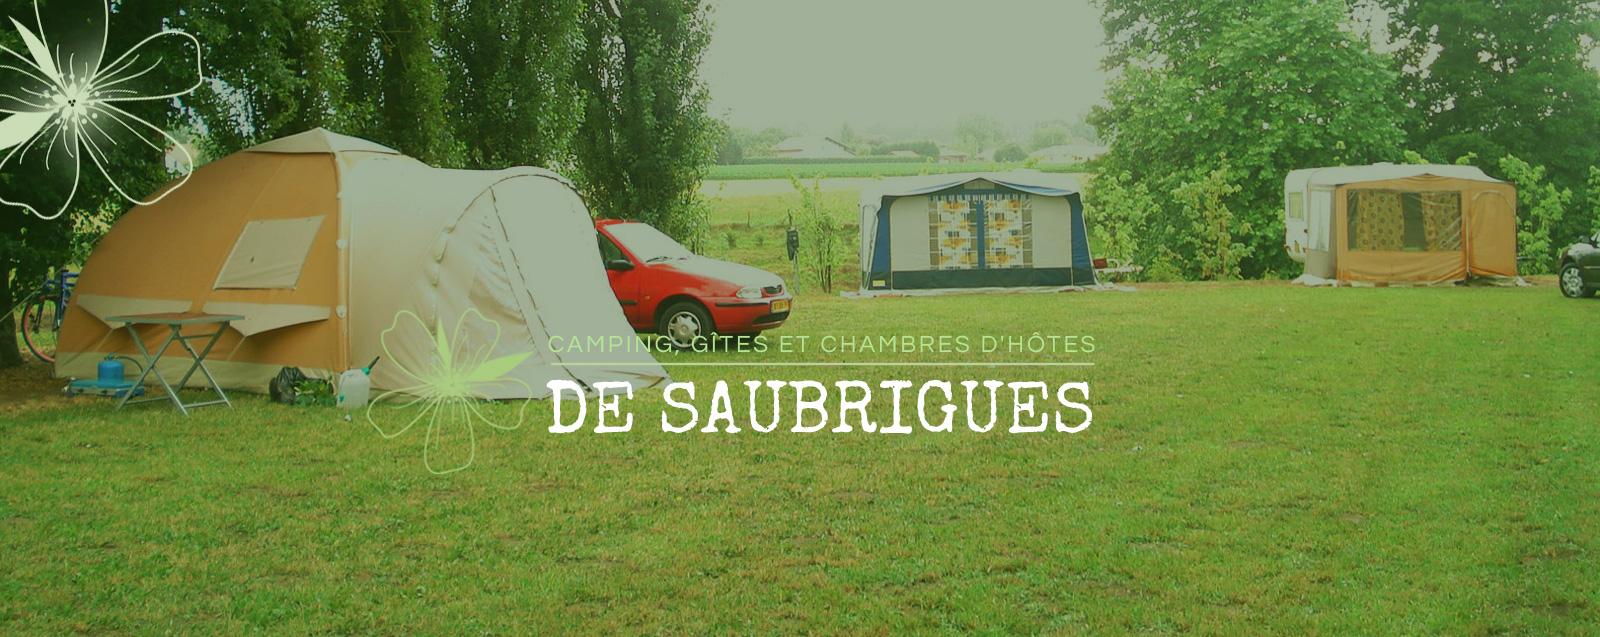 Camping camping la ferme saubrigues 40 camping - Chambre d hote saint jean de luz pas cher ...